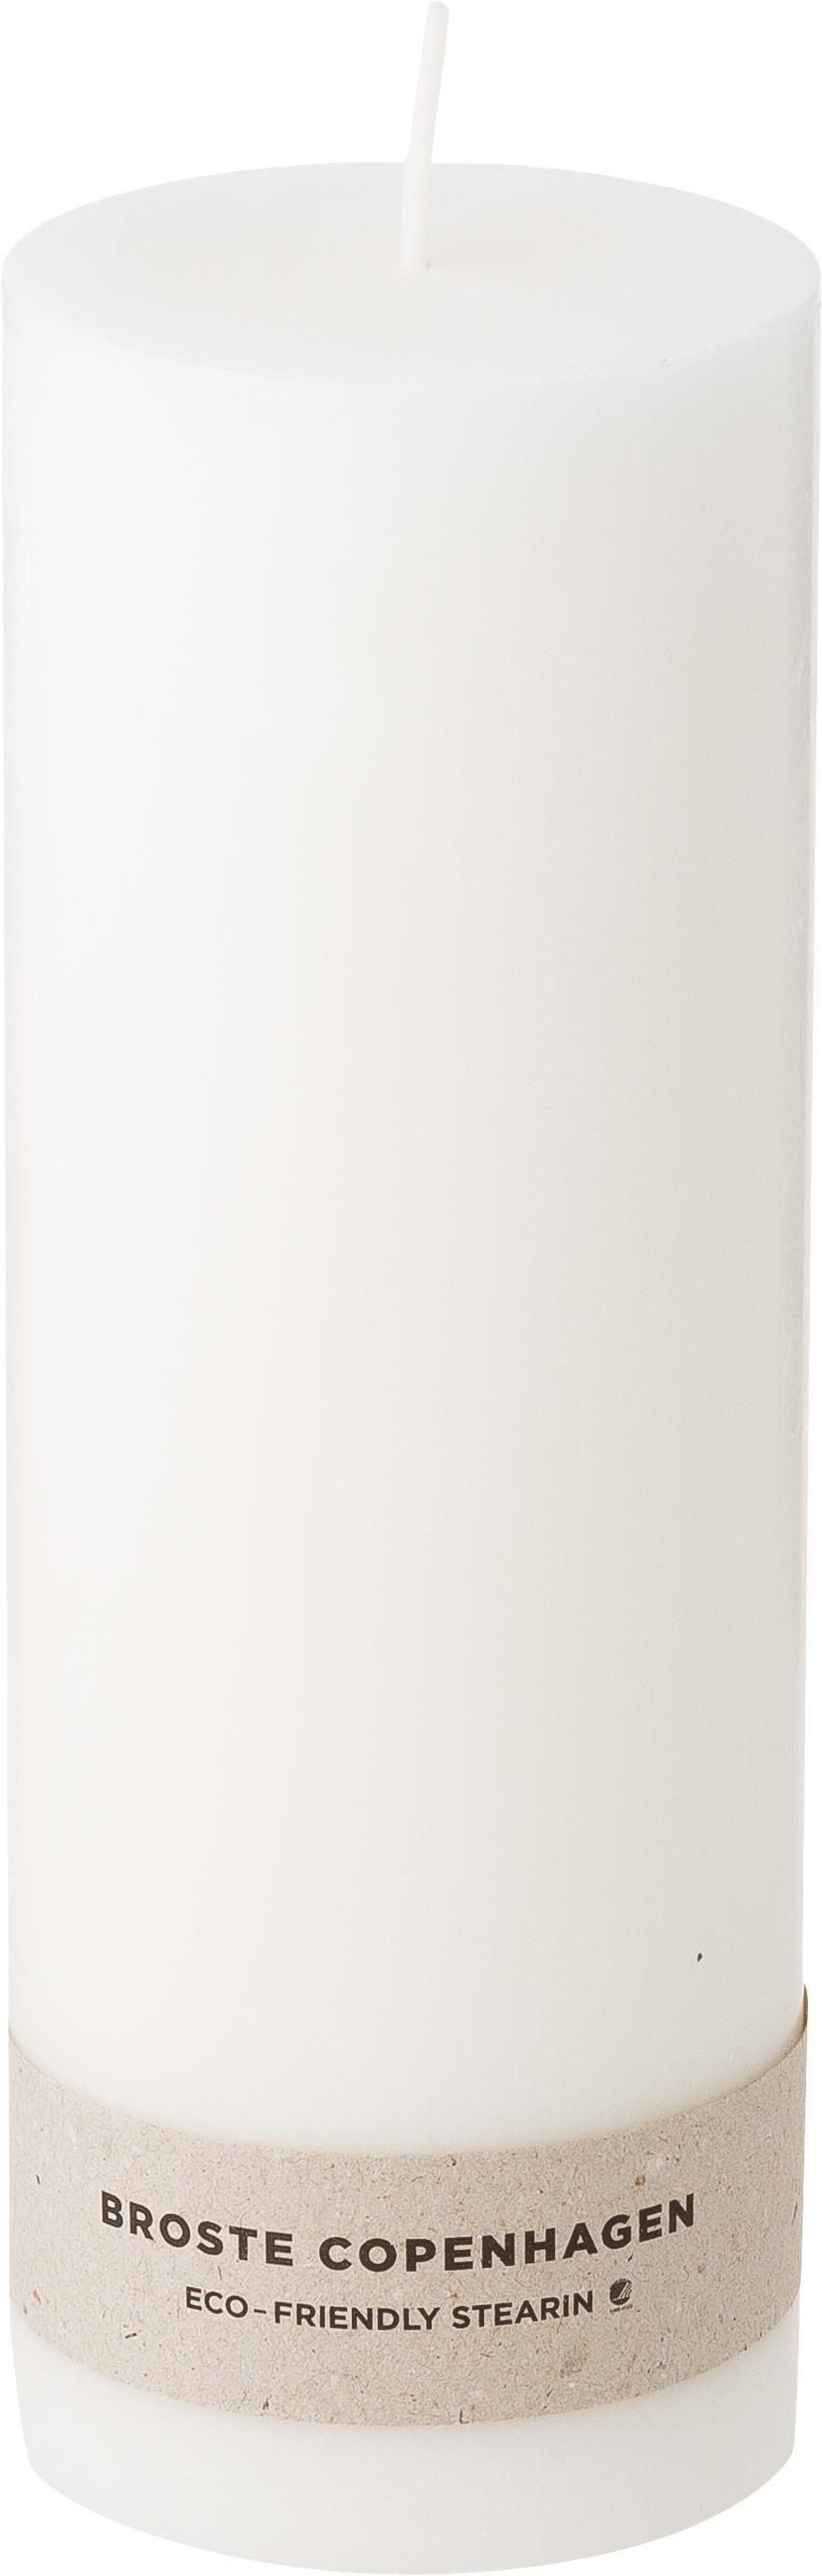 Candele pilastro Light, 2 pz., 100% stearina, Bianco, Ø 7 x A 20 cm